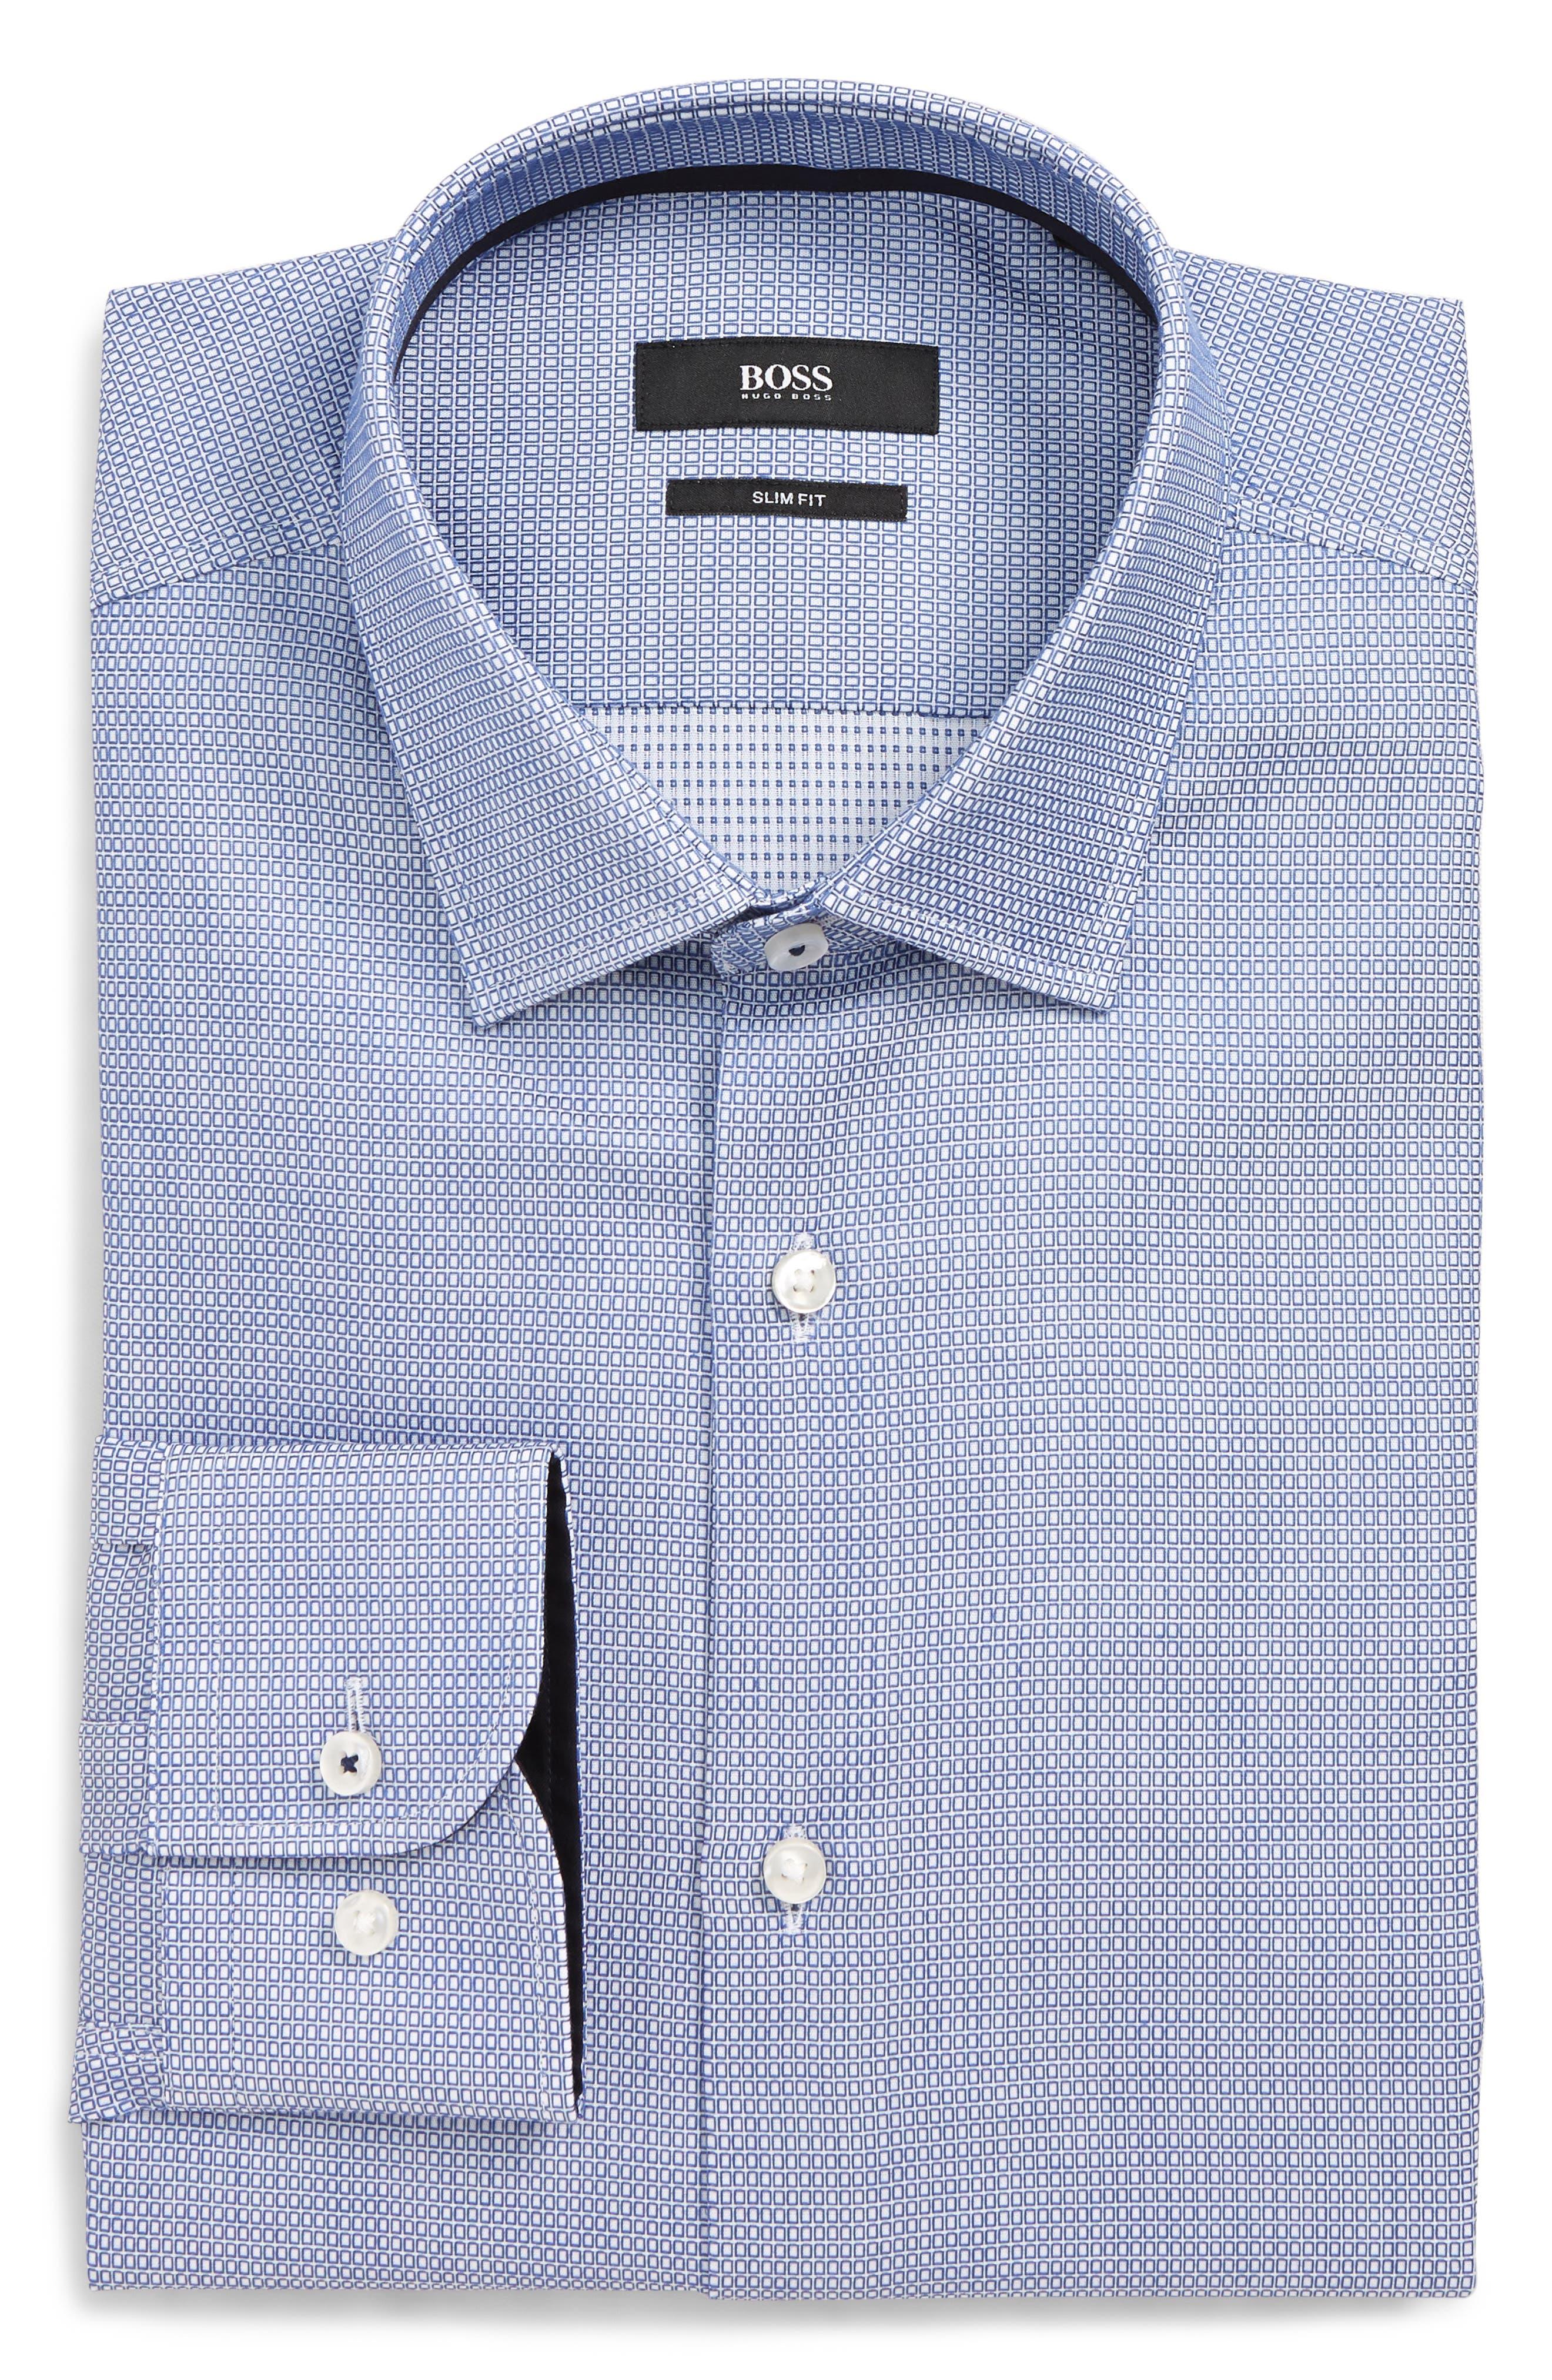 men\u0027s boss shirts nordstrom1418460 Hugo Boss Tuxedo Shirt Nordstrom #10